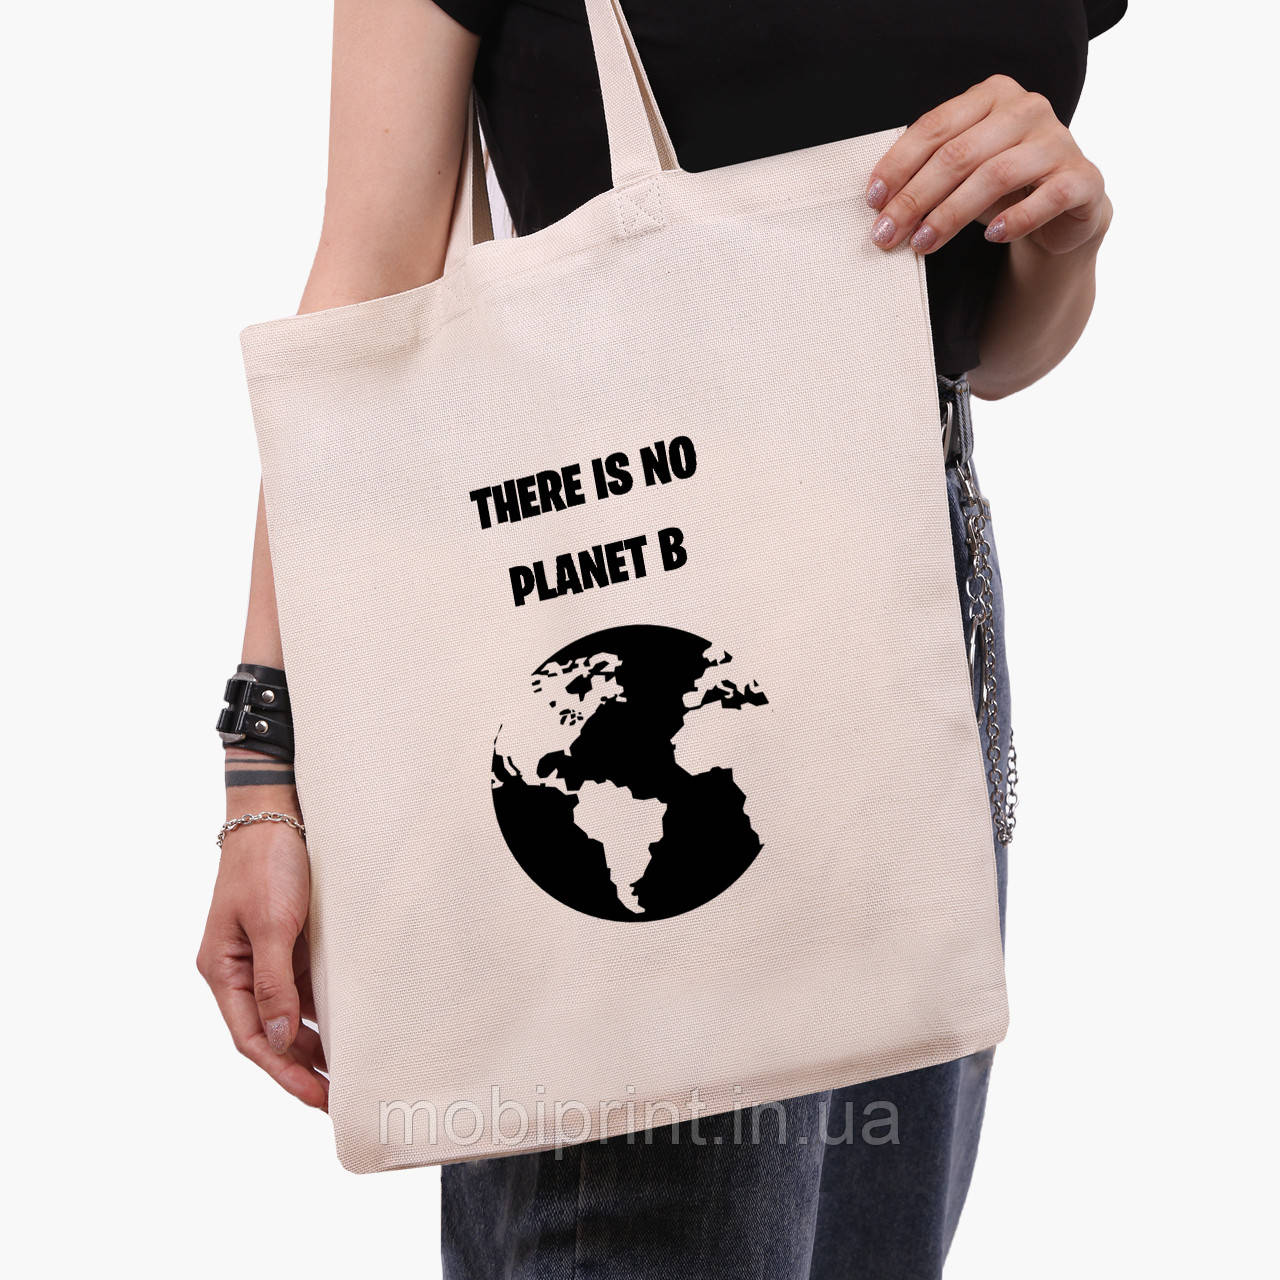 Эко сумка шоппер Экология (Ecology) (9227-1333)  экосумка шопер 41*35 см